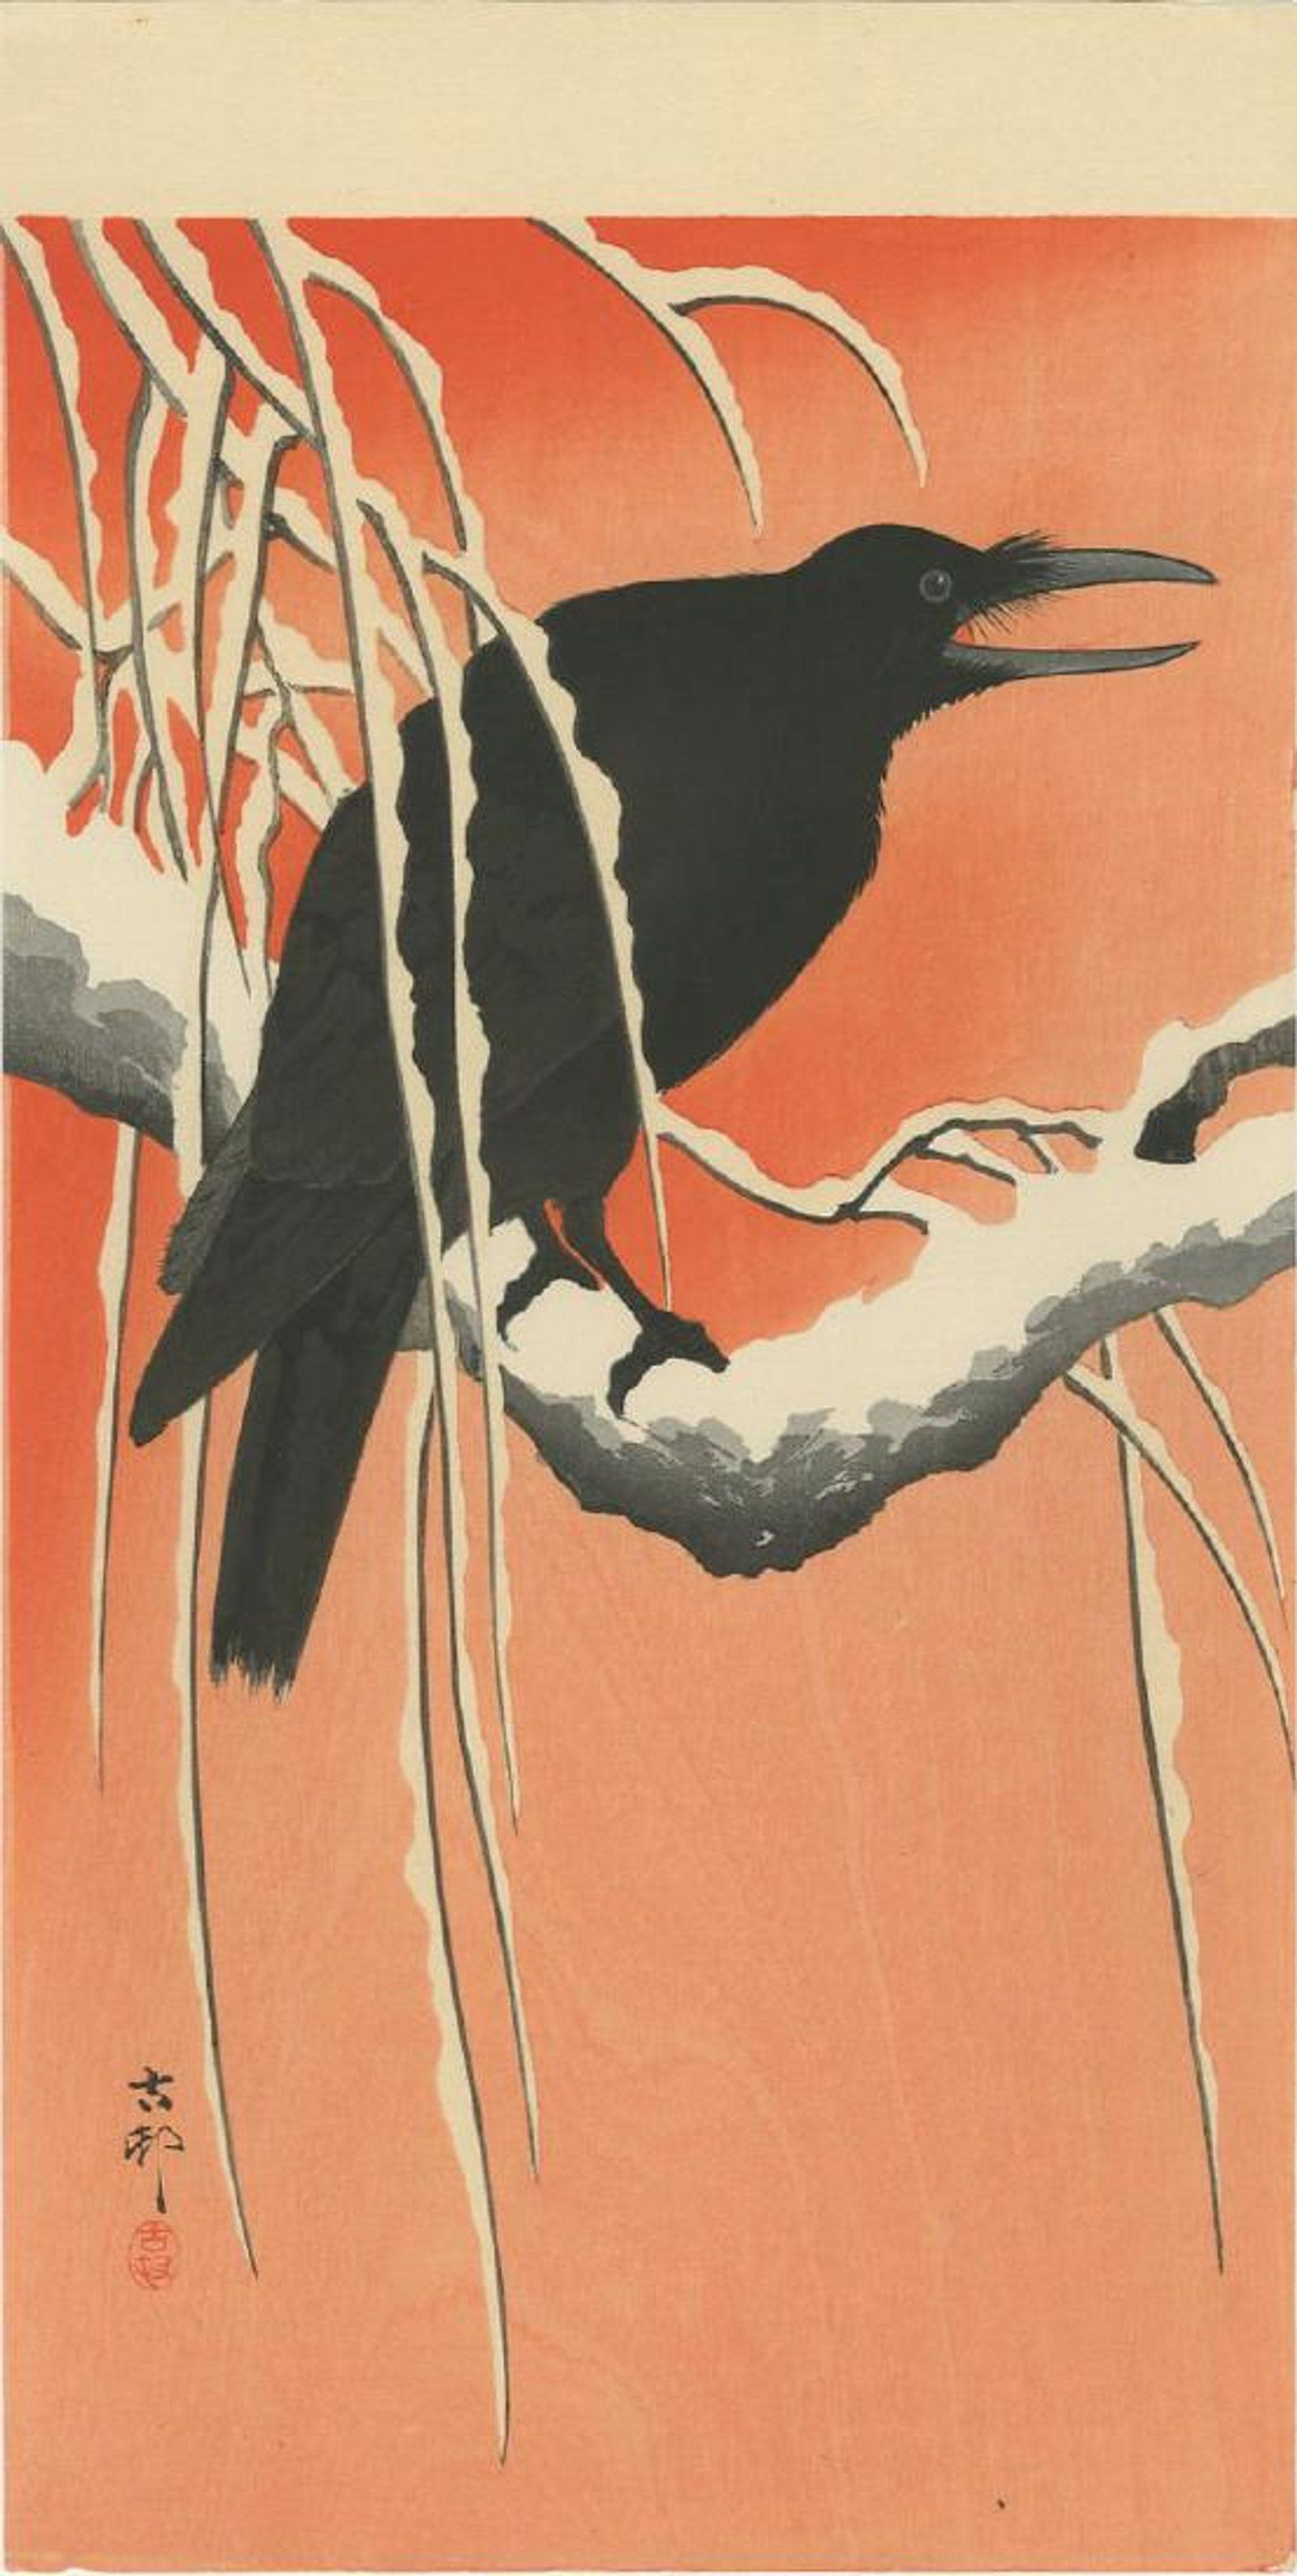 Ohara Koson Crow On Snowy Branch Woodblock Pre Eq Feb 18 2018 Ukiyoe Gallery Japanese Woodblock Prints In Ny Japan Print Japanese Art Japanese Woodblock Printing